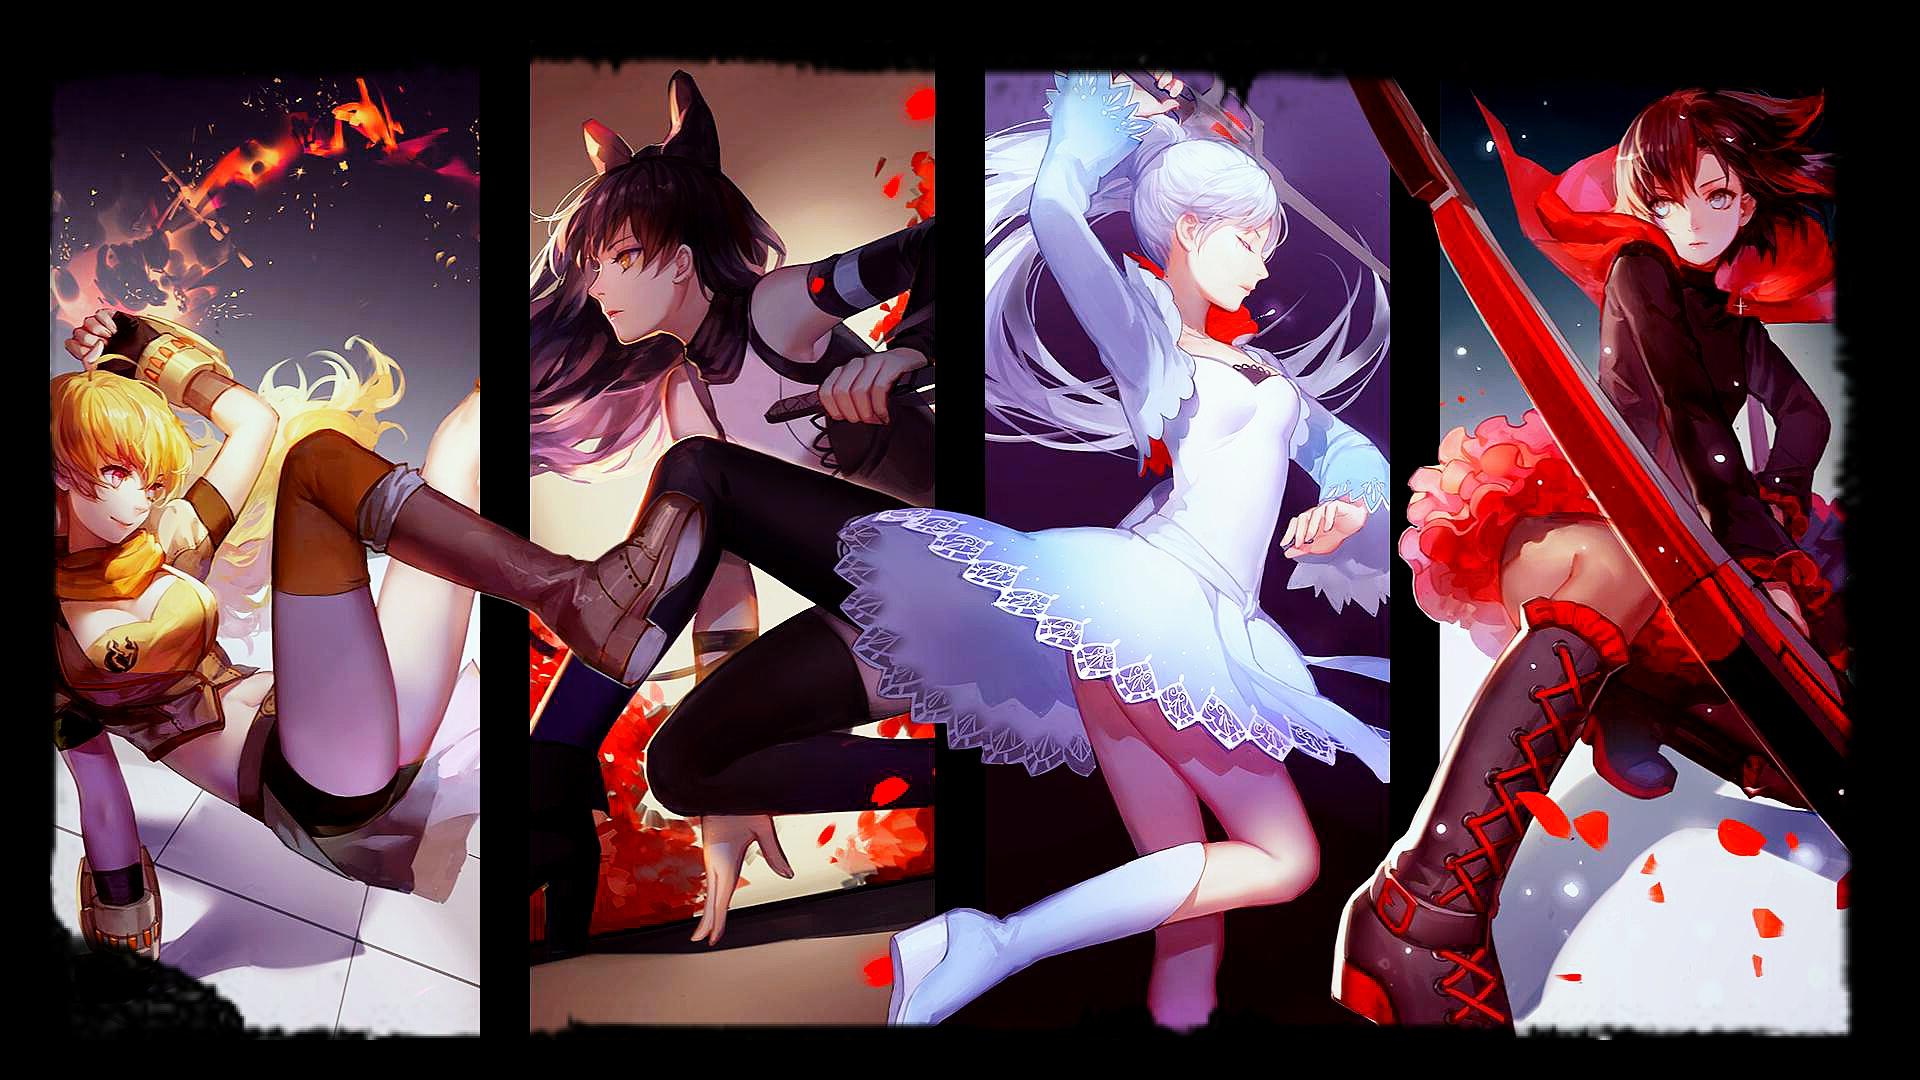 3200x1800 anime sexy